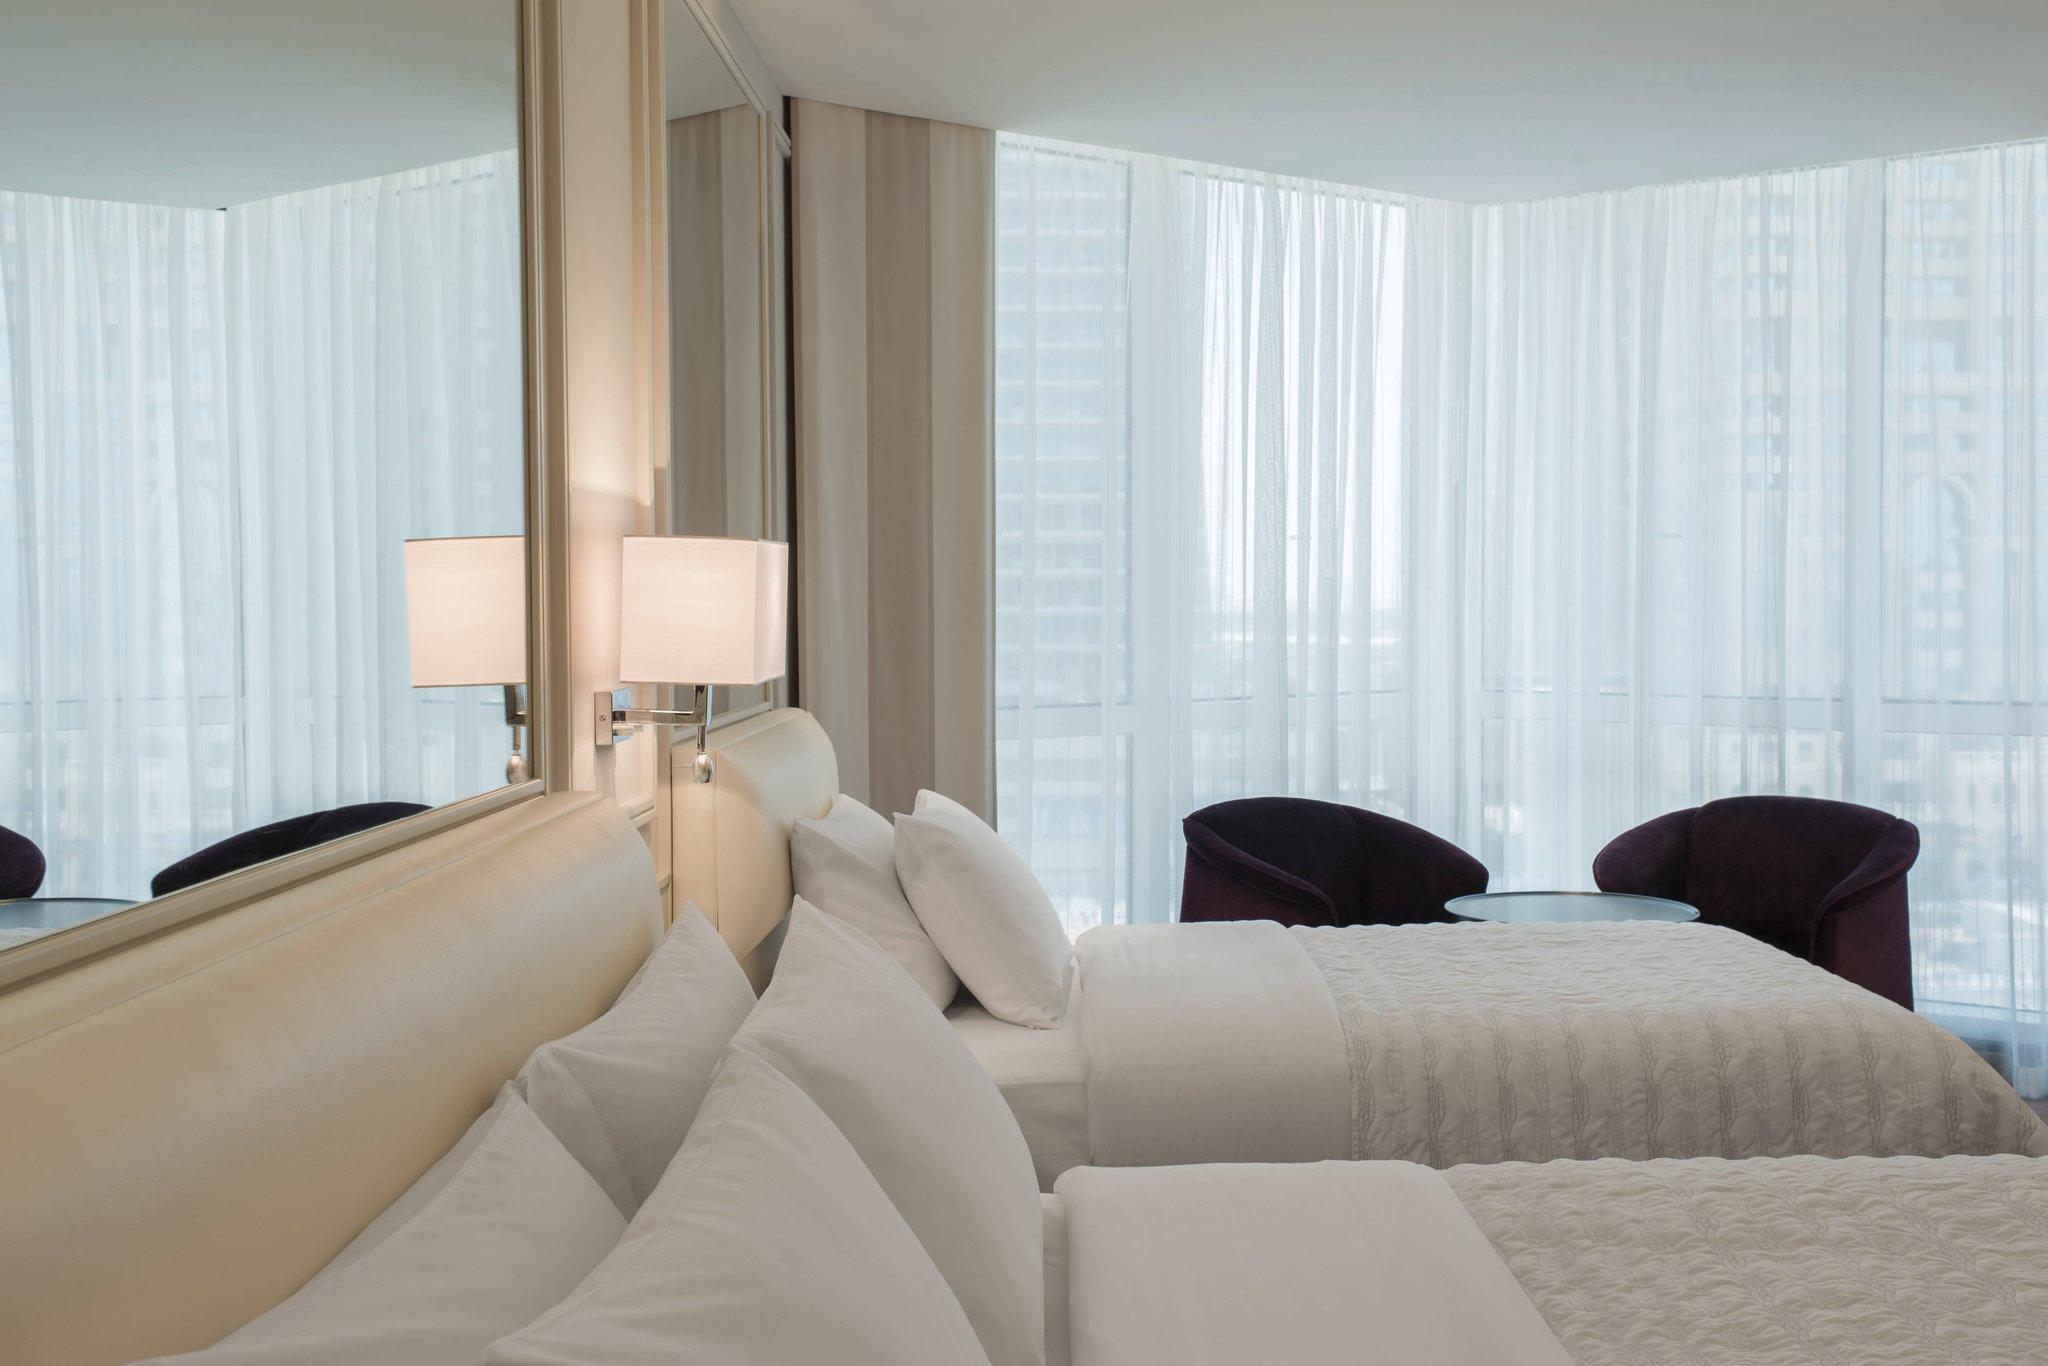 Le Méridien Mina Seyahi Beach Resort & Marina